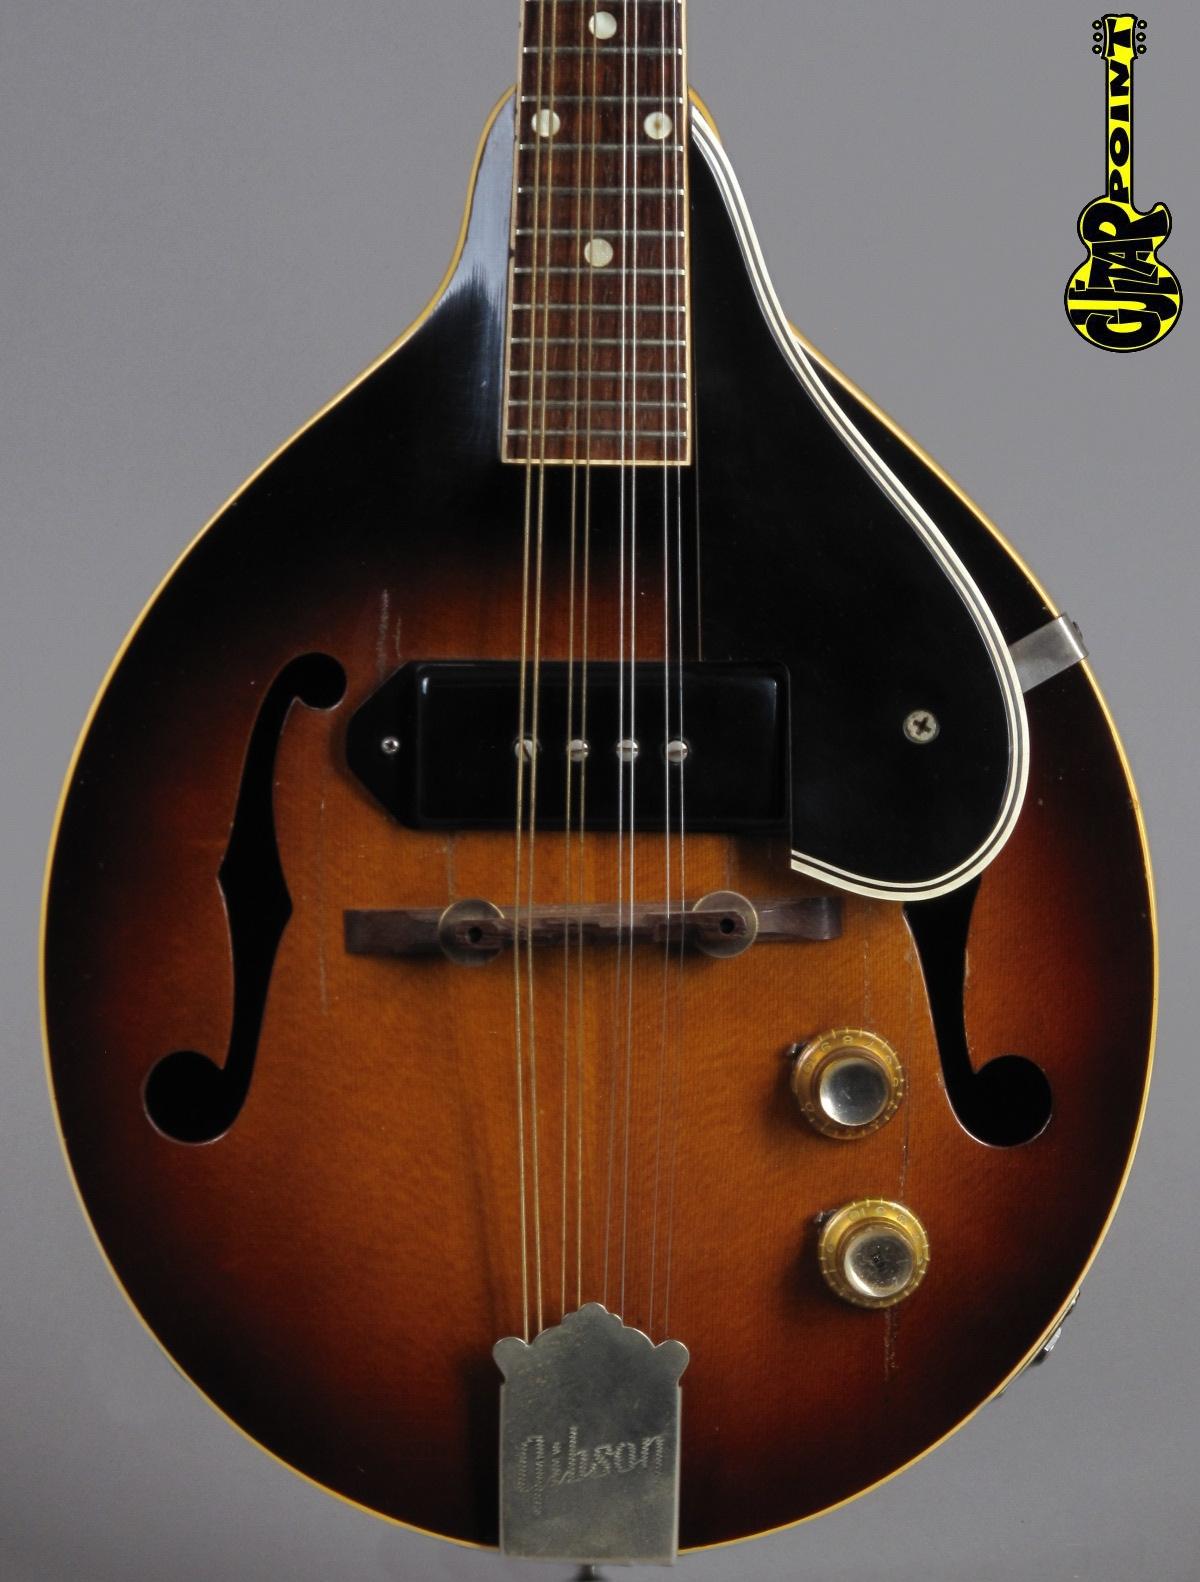 1962 Gibson EM-150 Electric Mandolin